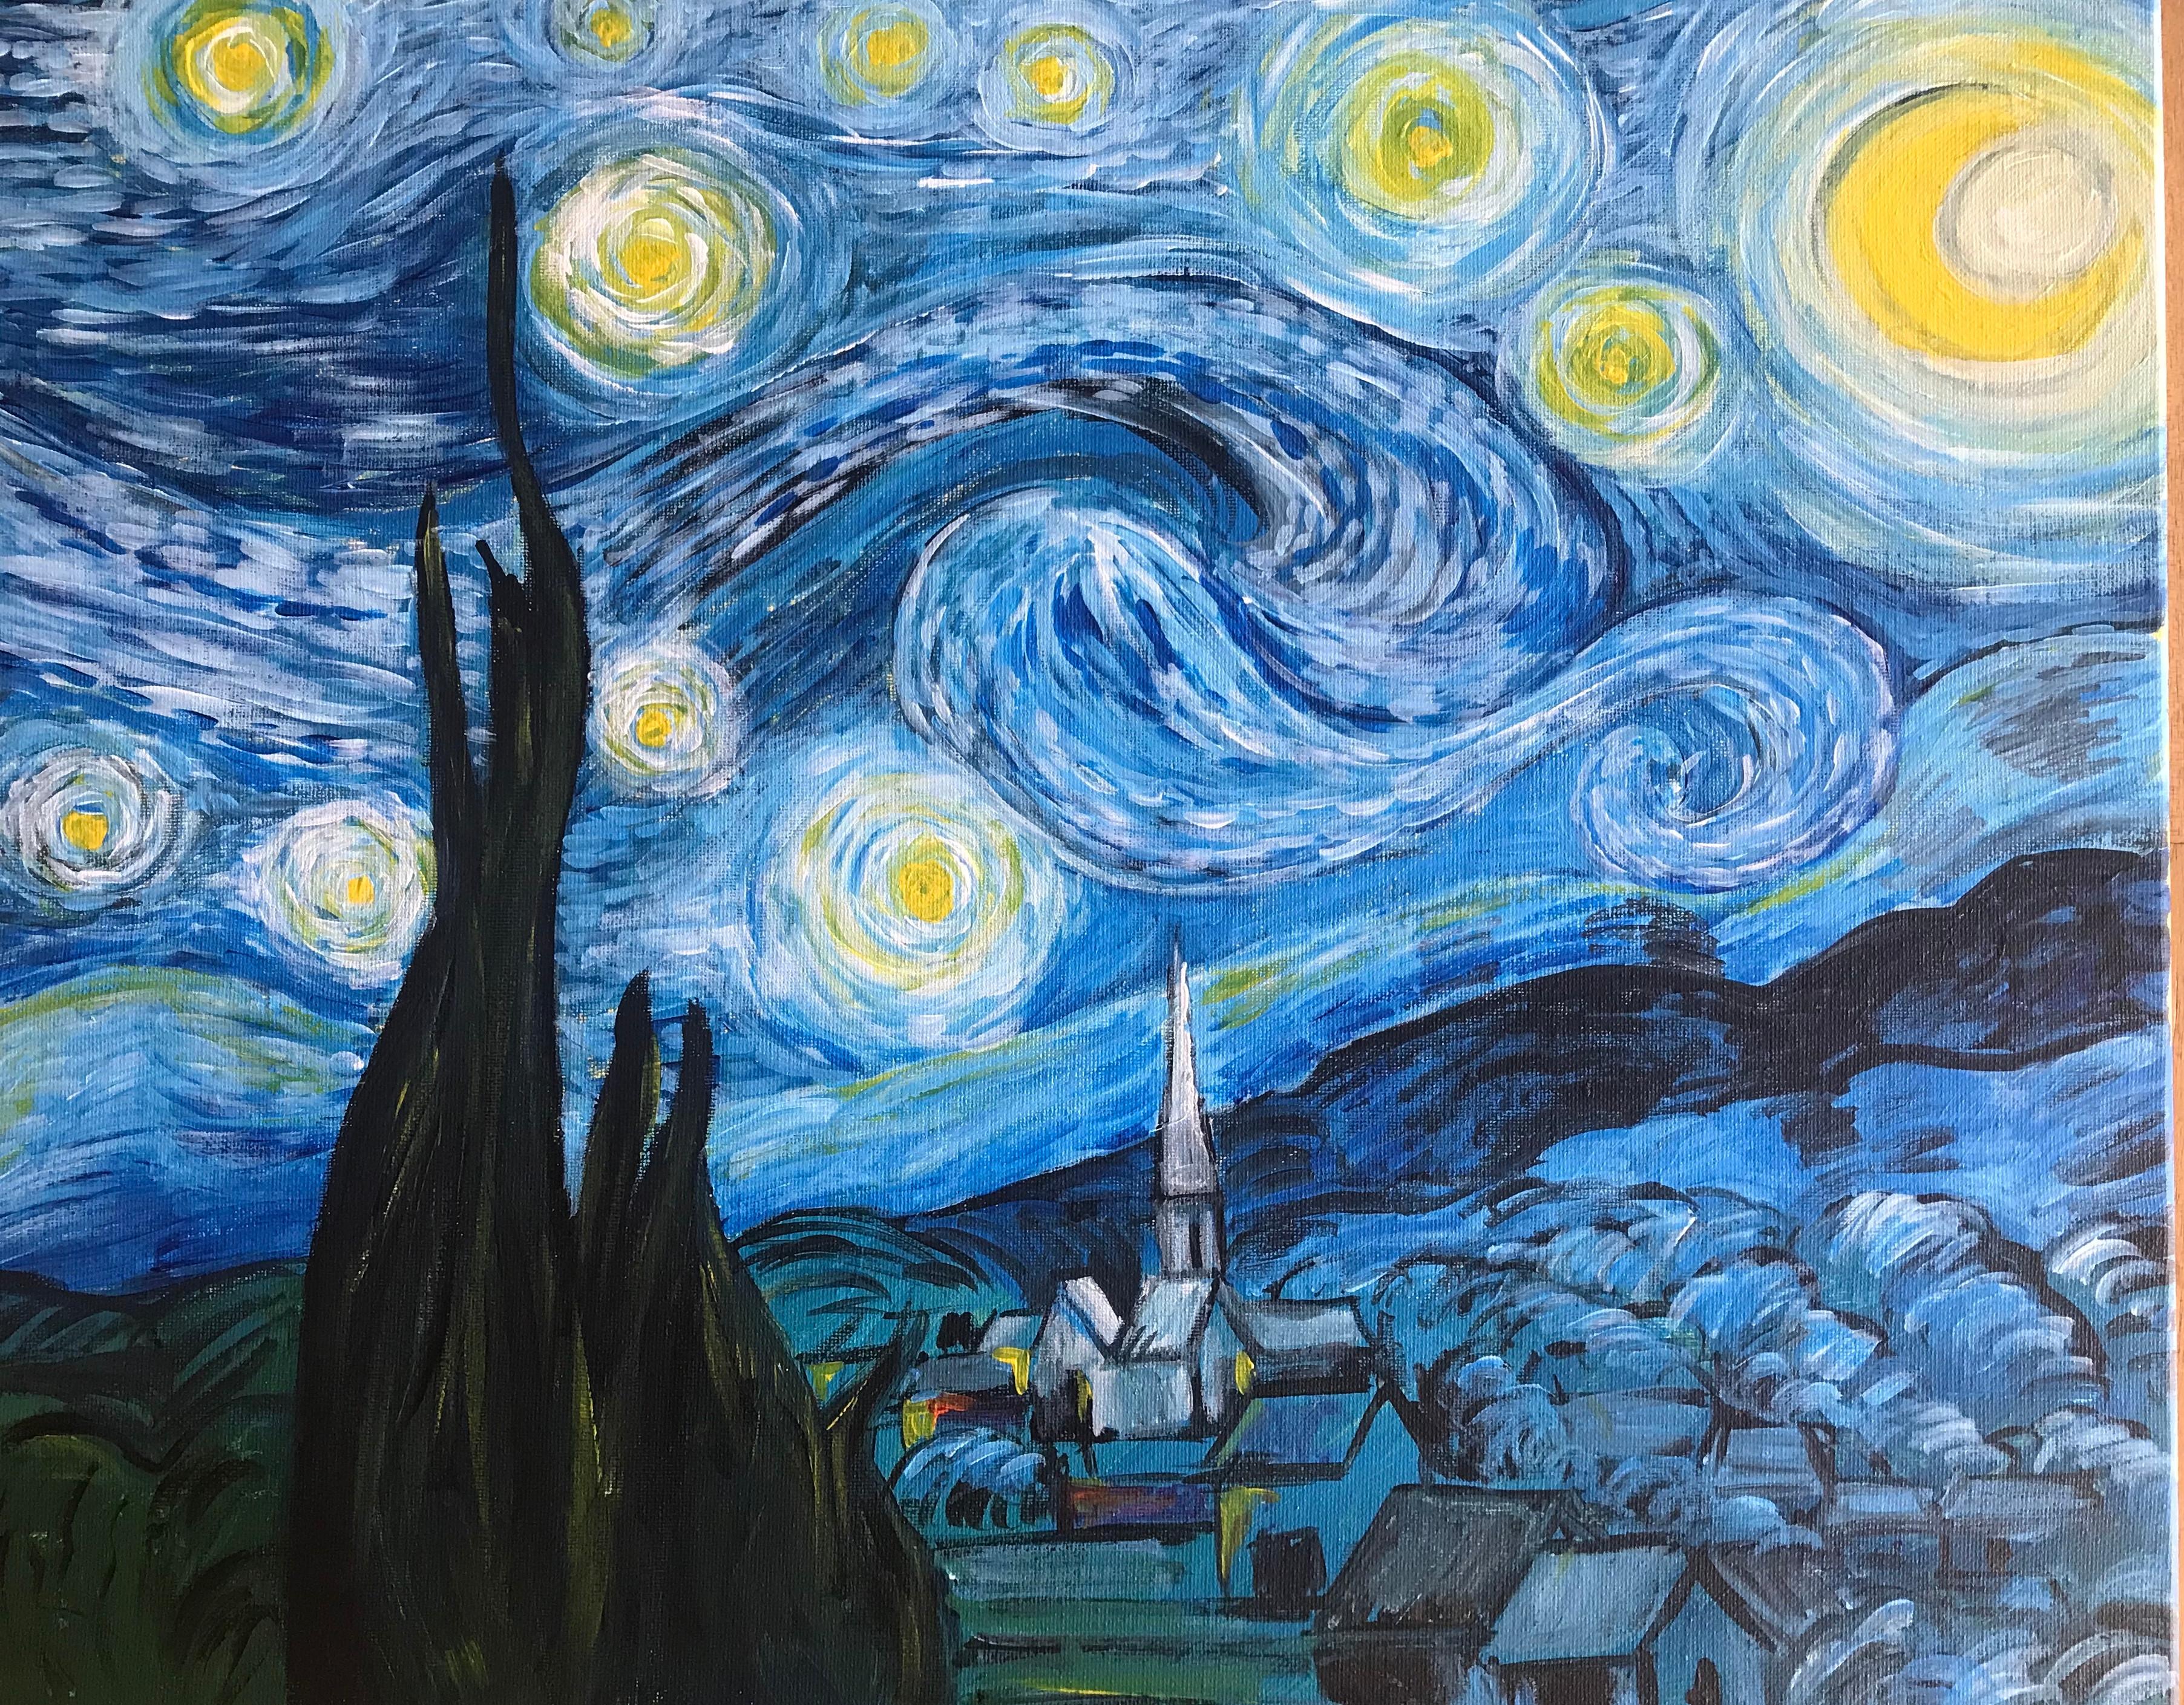 Van Gogh's Starry Night 18/10/2019